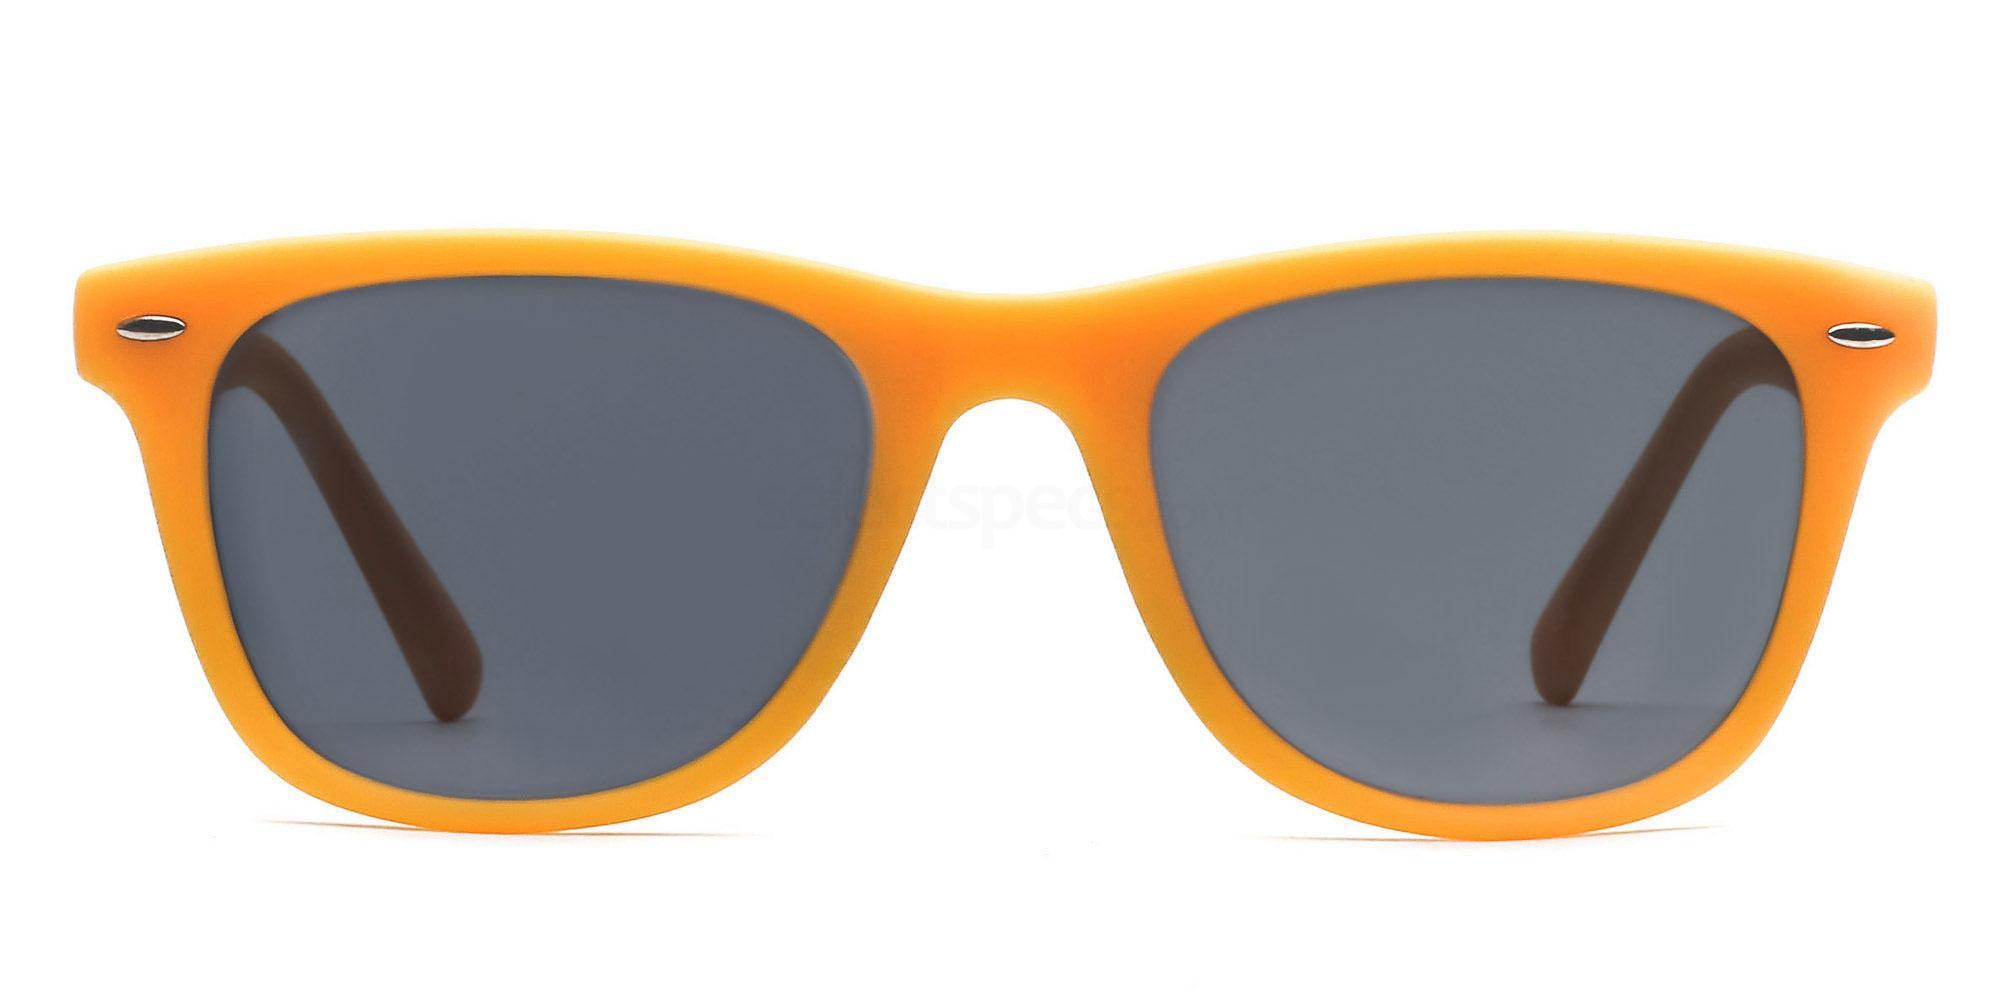 C2 8121 - Yellow (Sunglasses) Sunglasses, Savannah